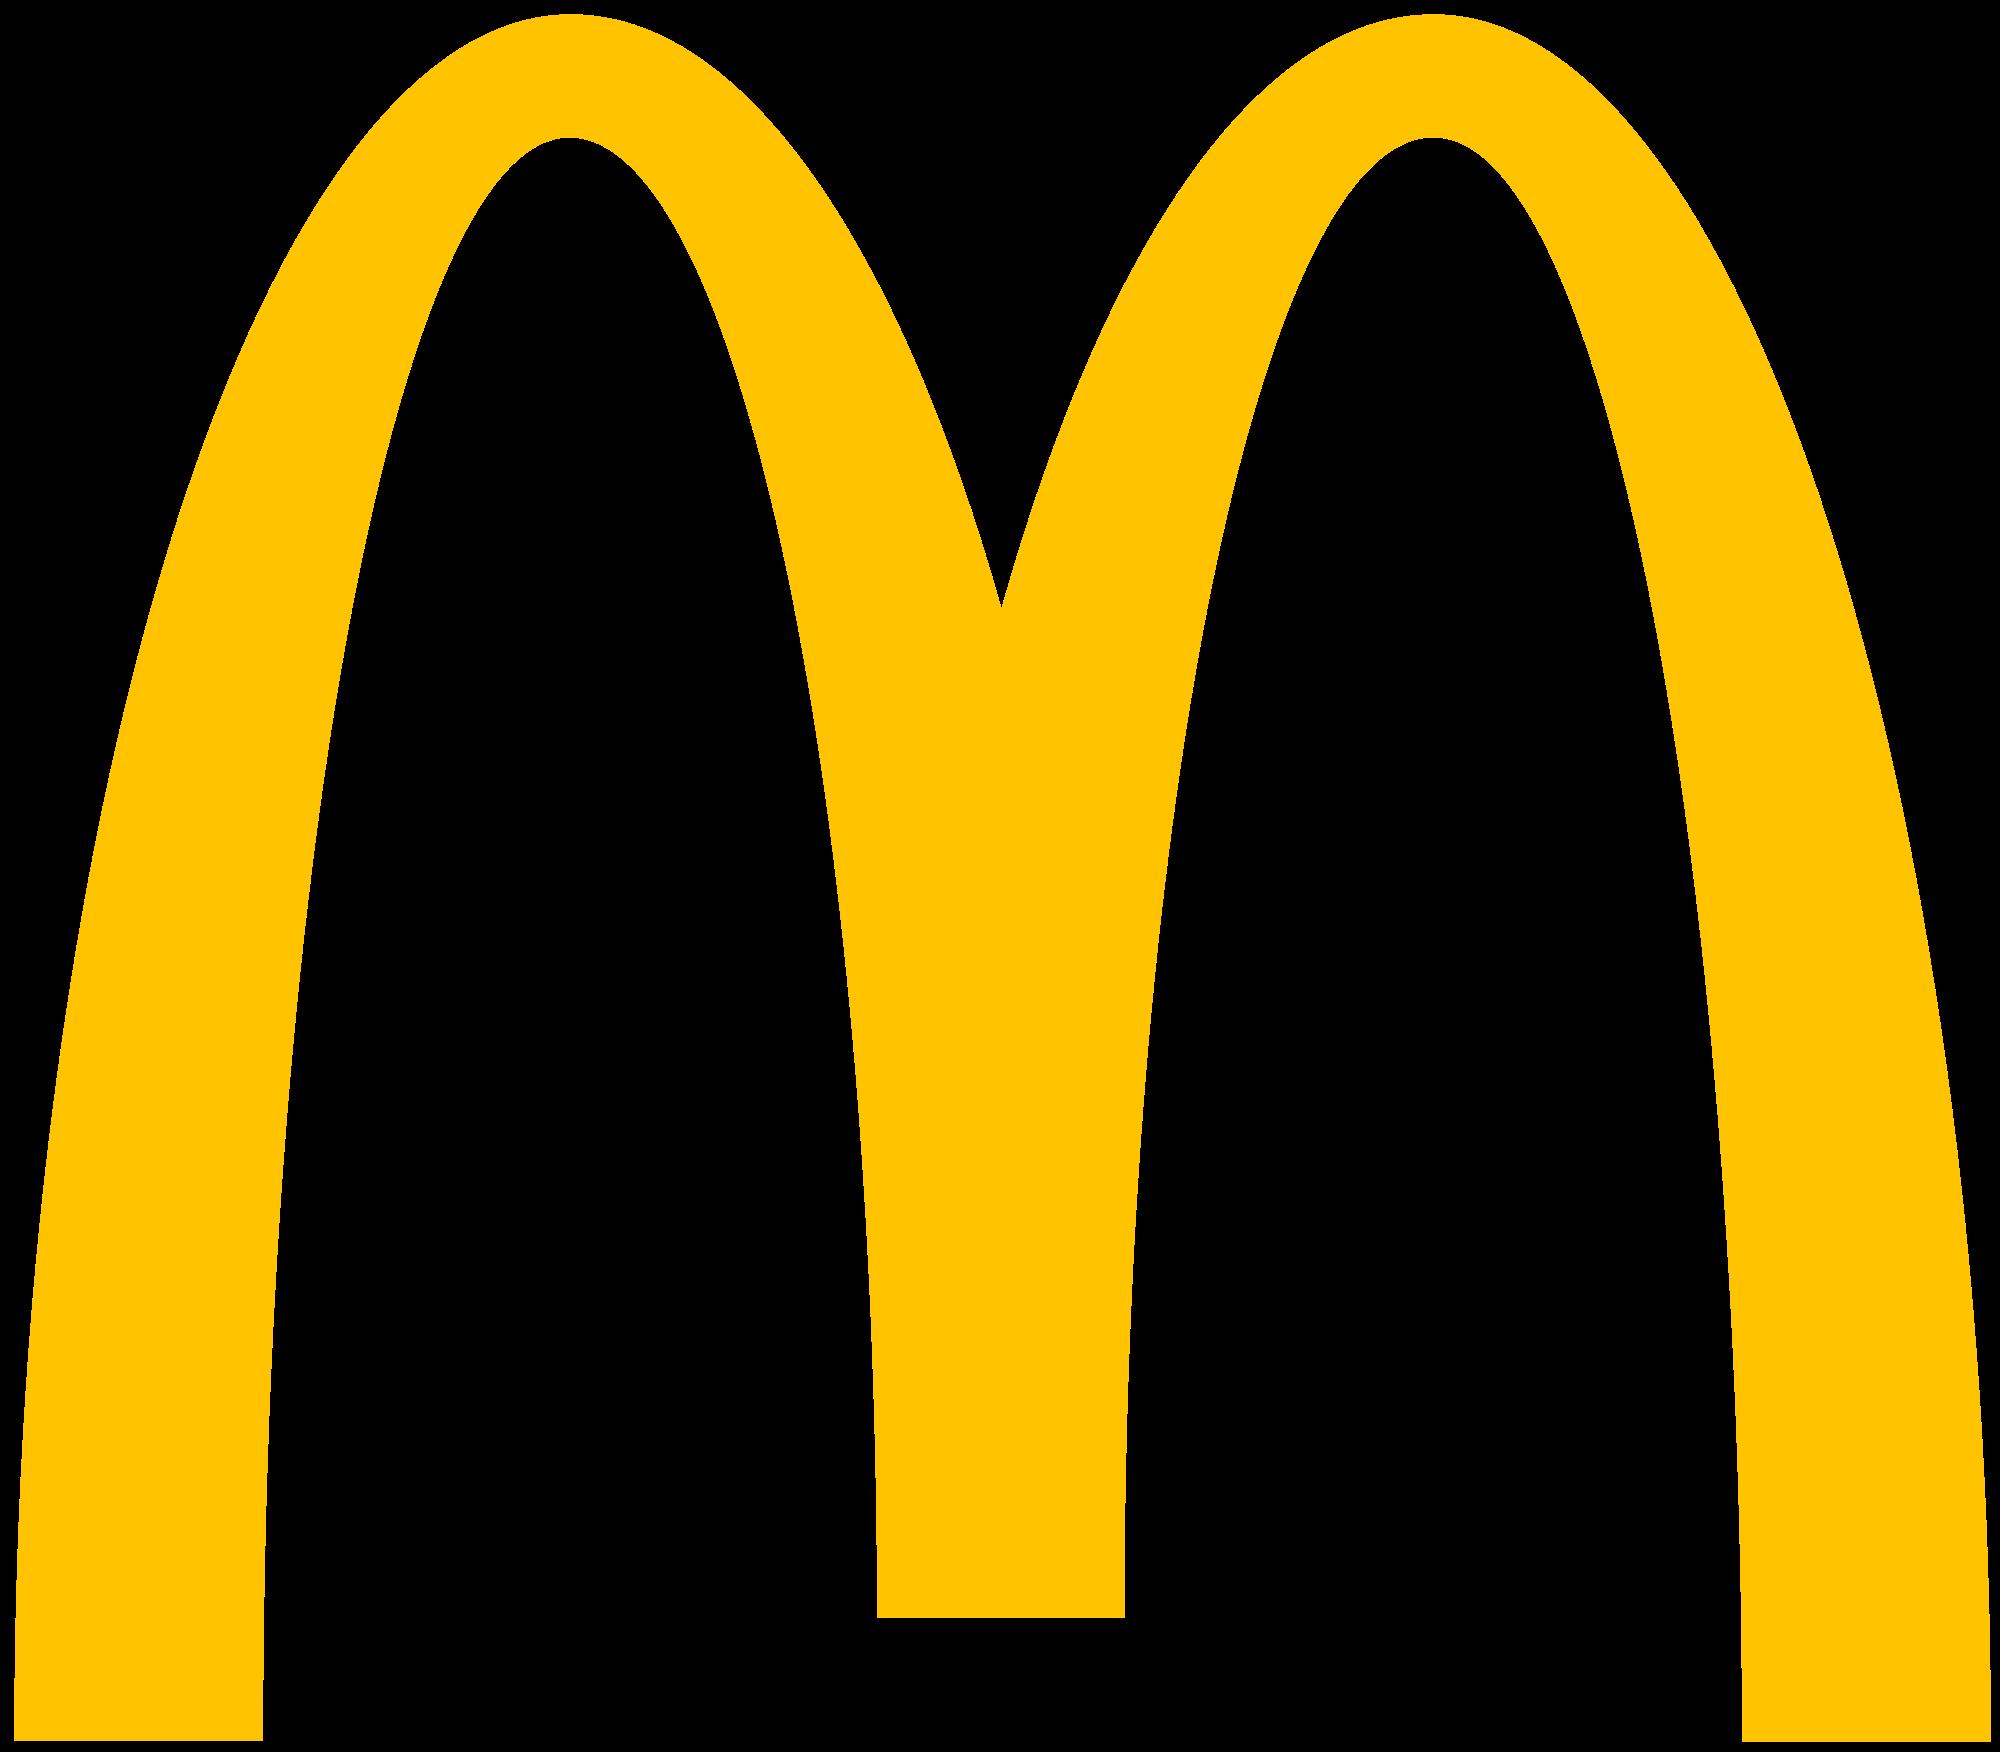 vector library download McDonald